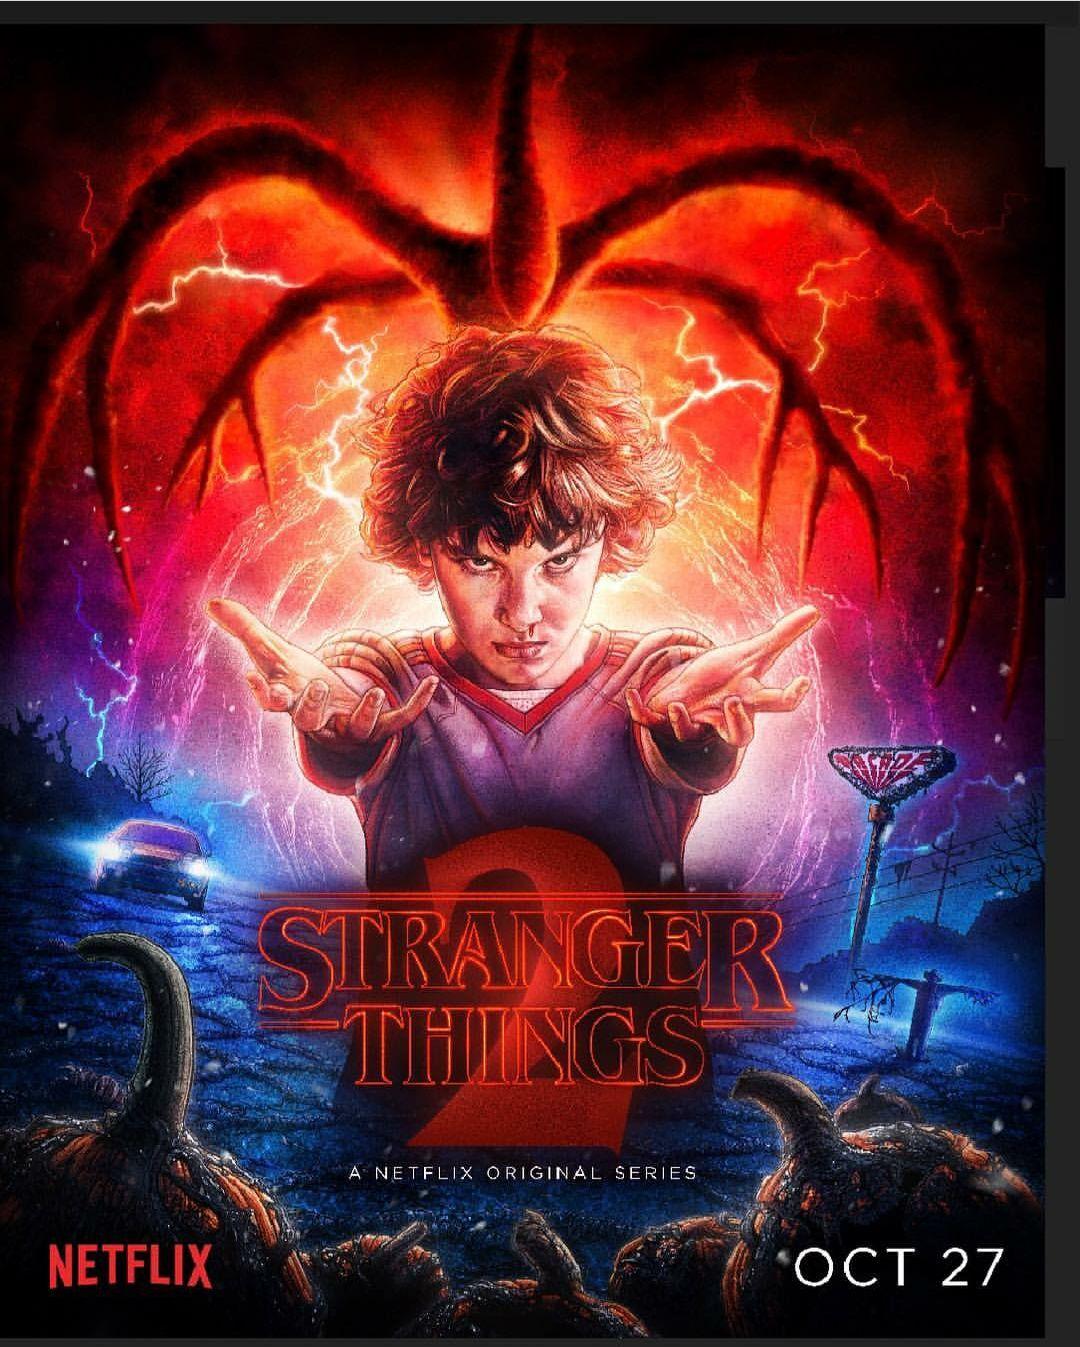 Stranger Things: 010 - Eleven - Wattpad